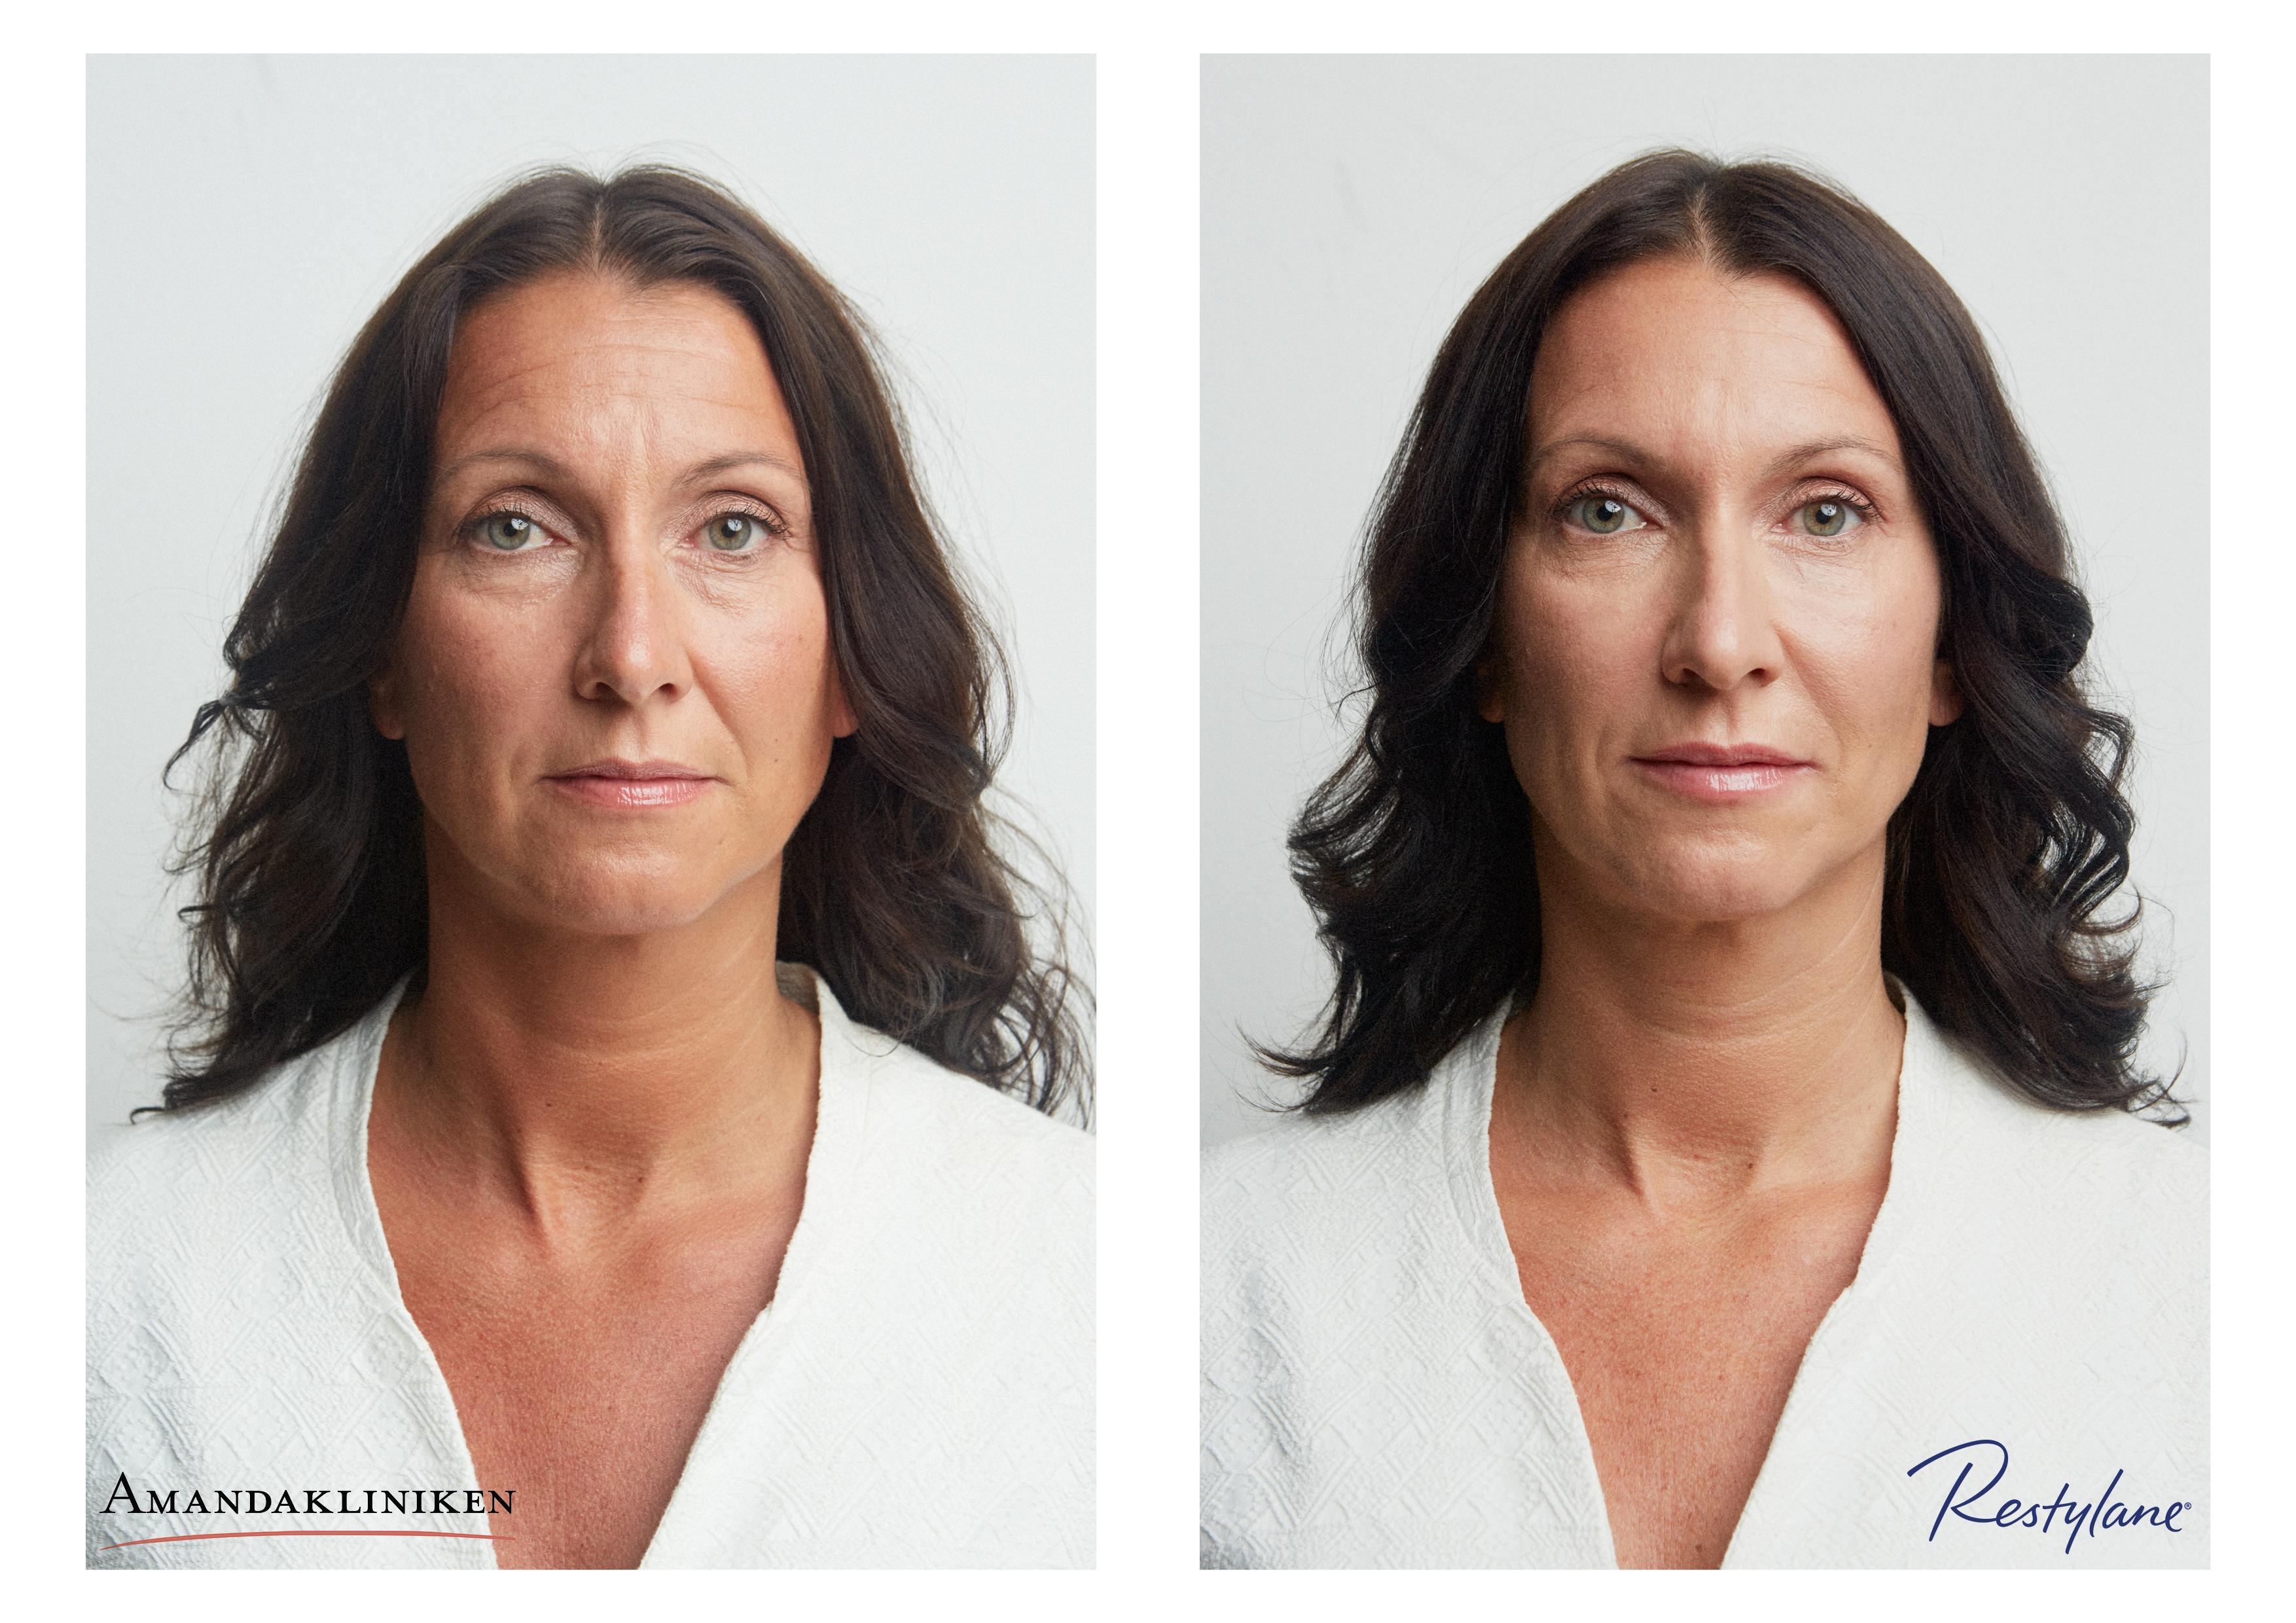 Amandakliniken Före & Efter Botox Fillers Restylane